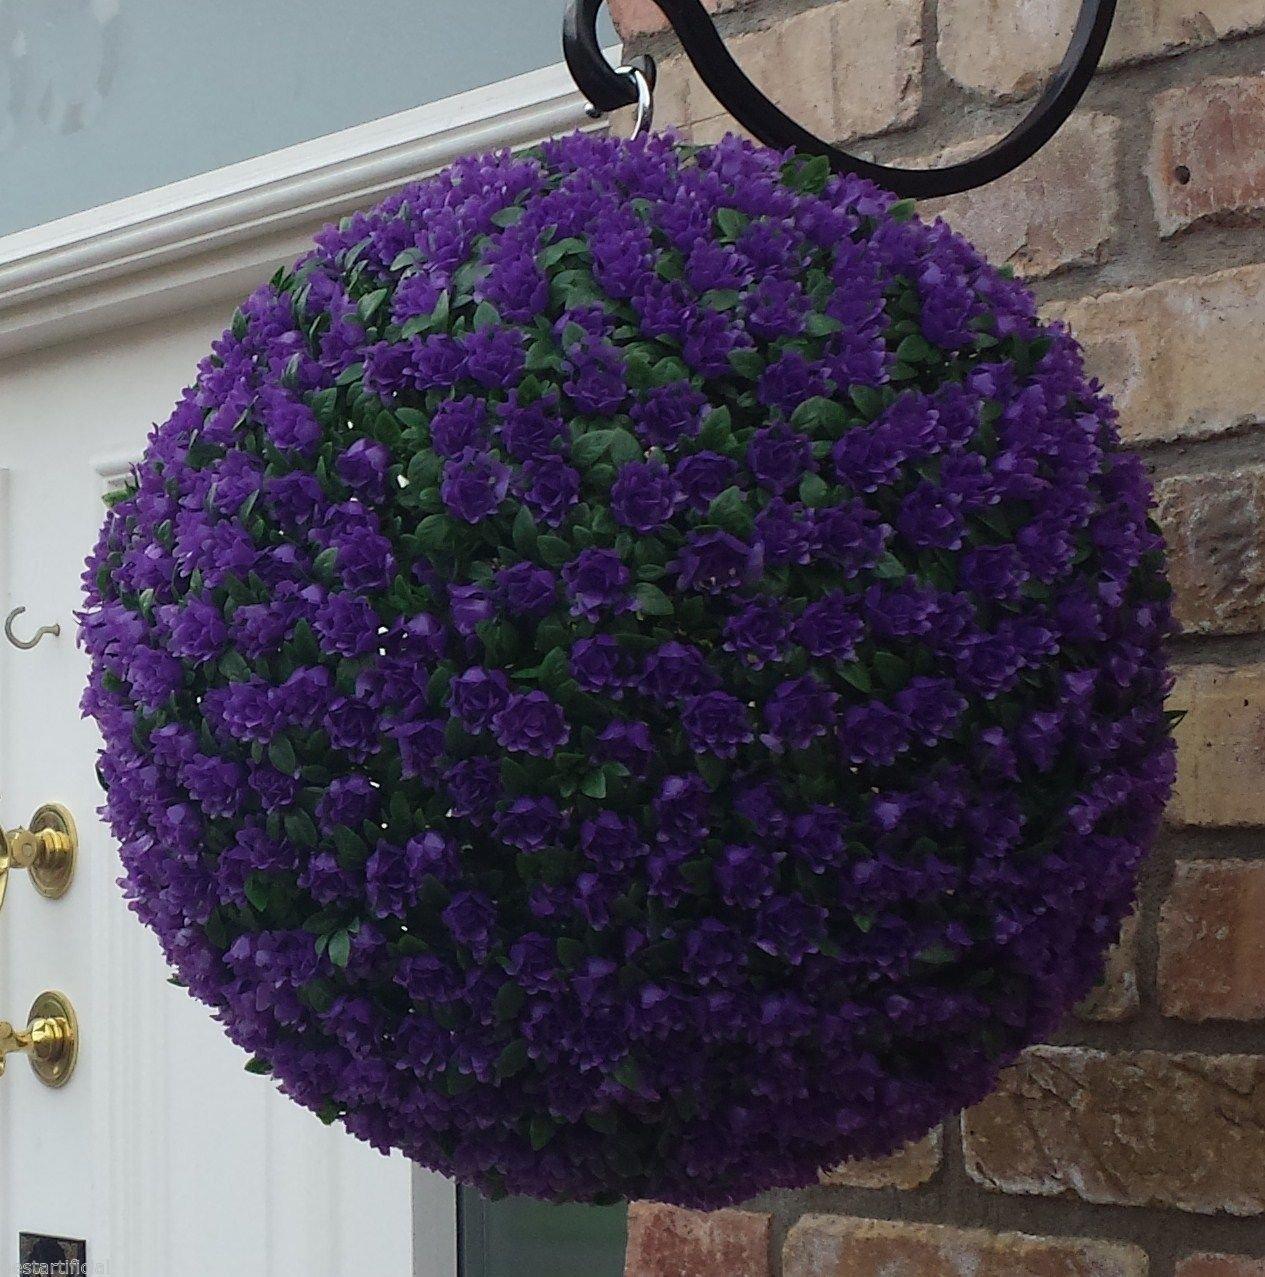 Artificial hanging ball